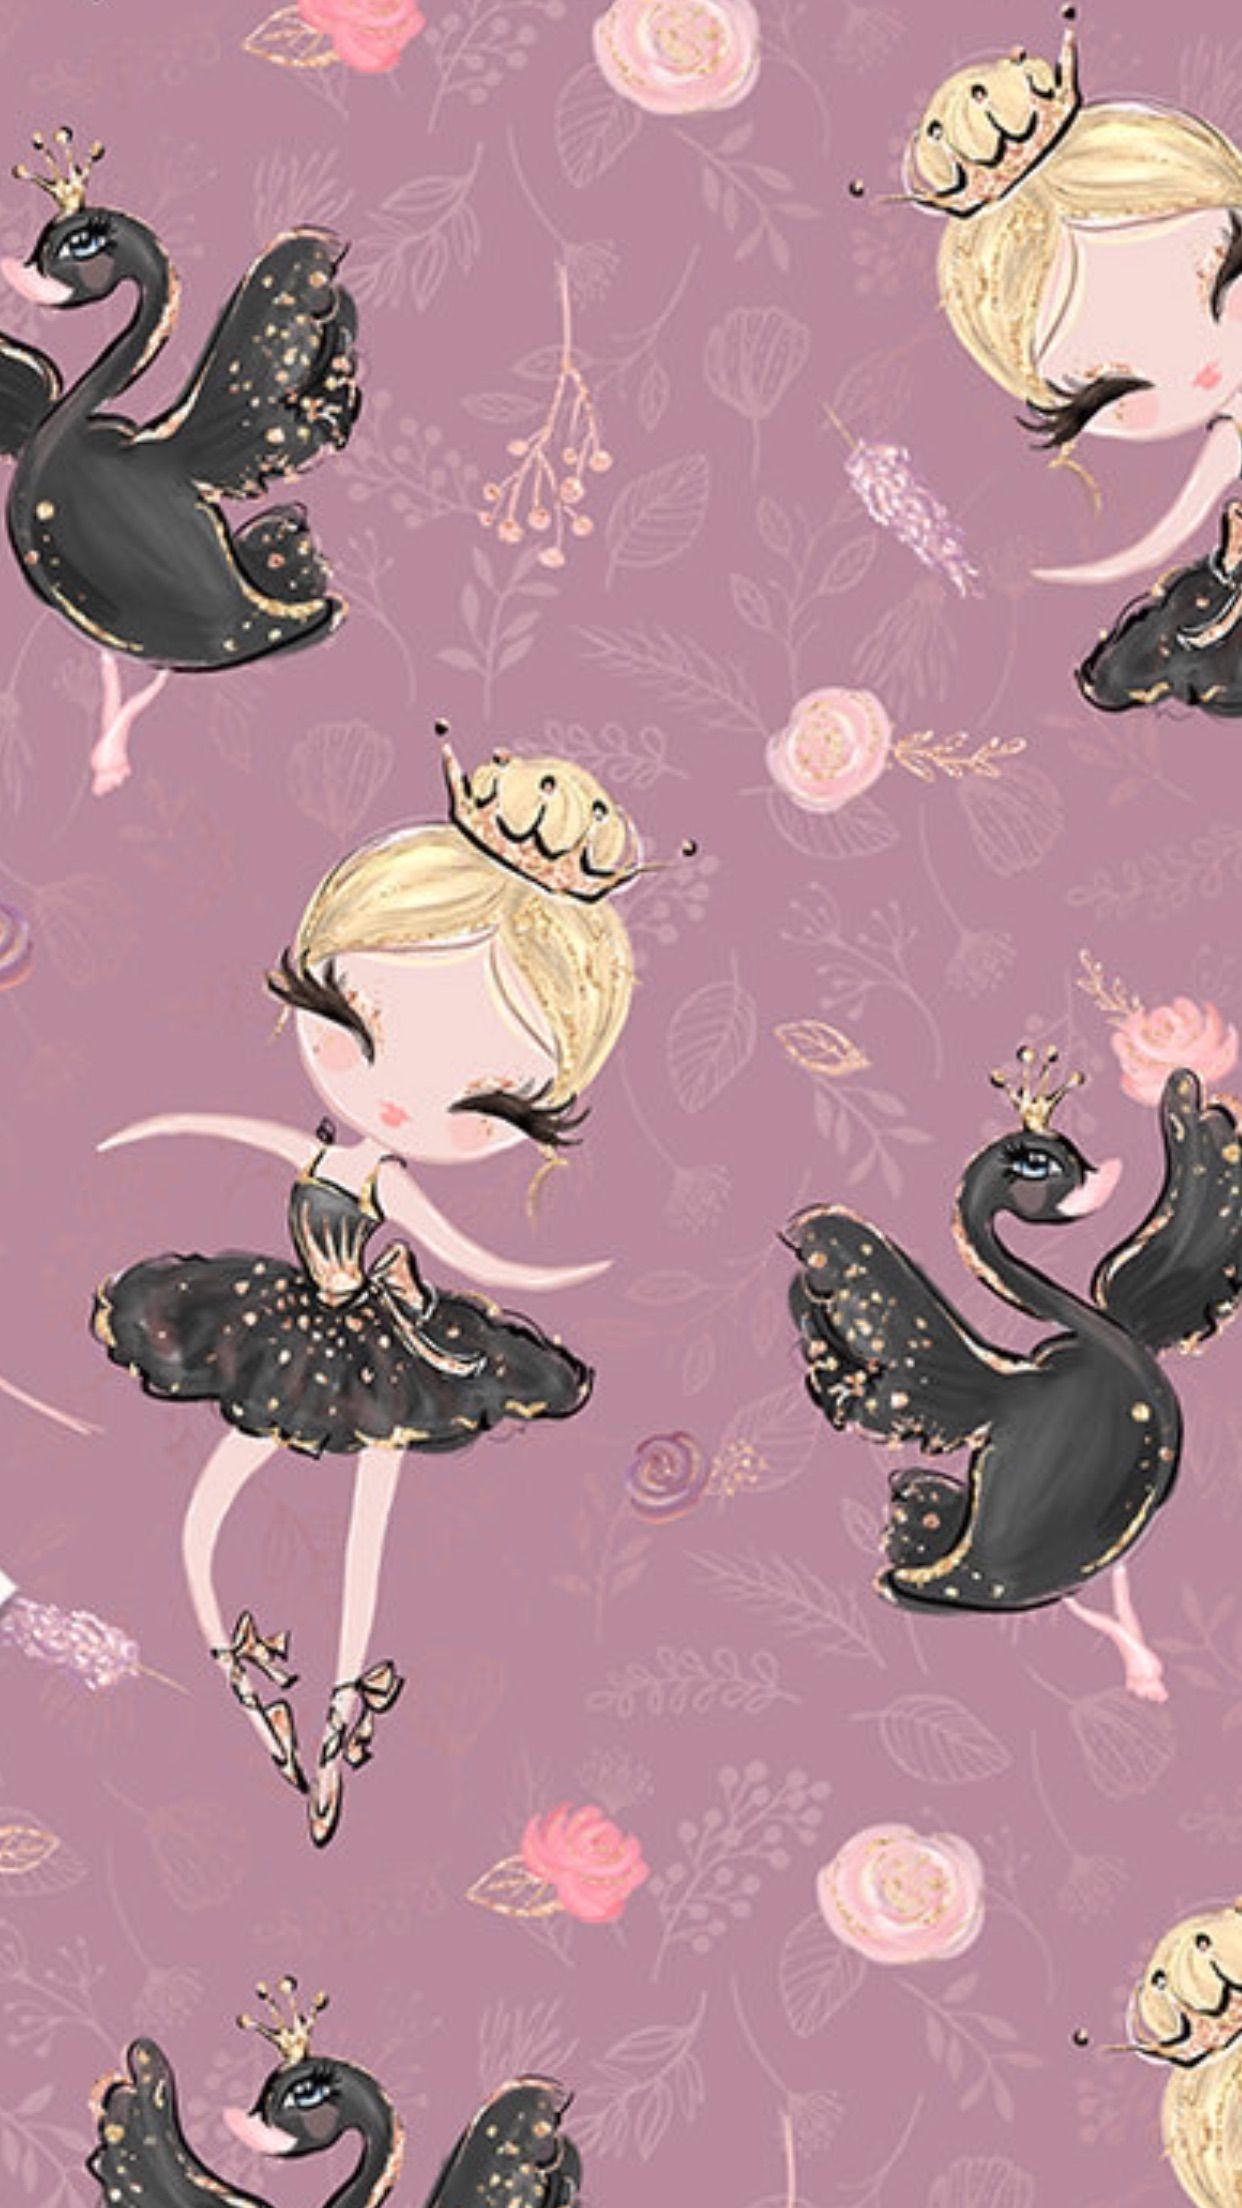 Pin By Amal Khalifa On Wallpapers Pattern Wallpaper Unicorn Wallpaper Cute Wallpapers